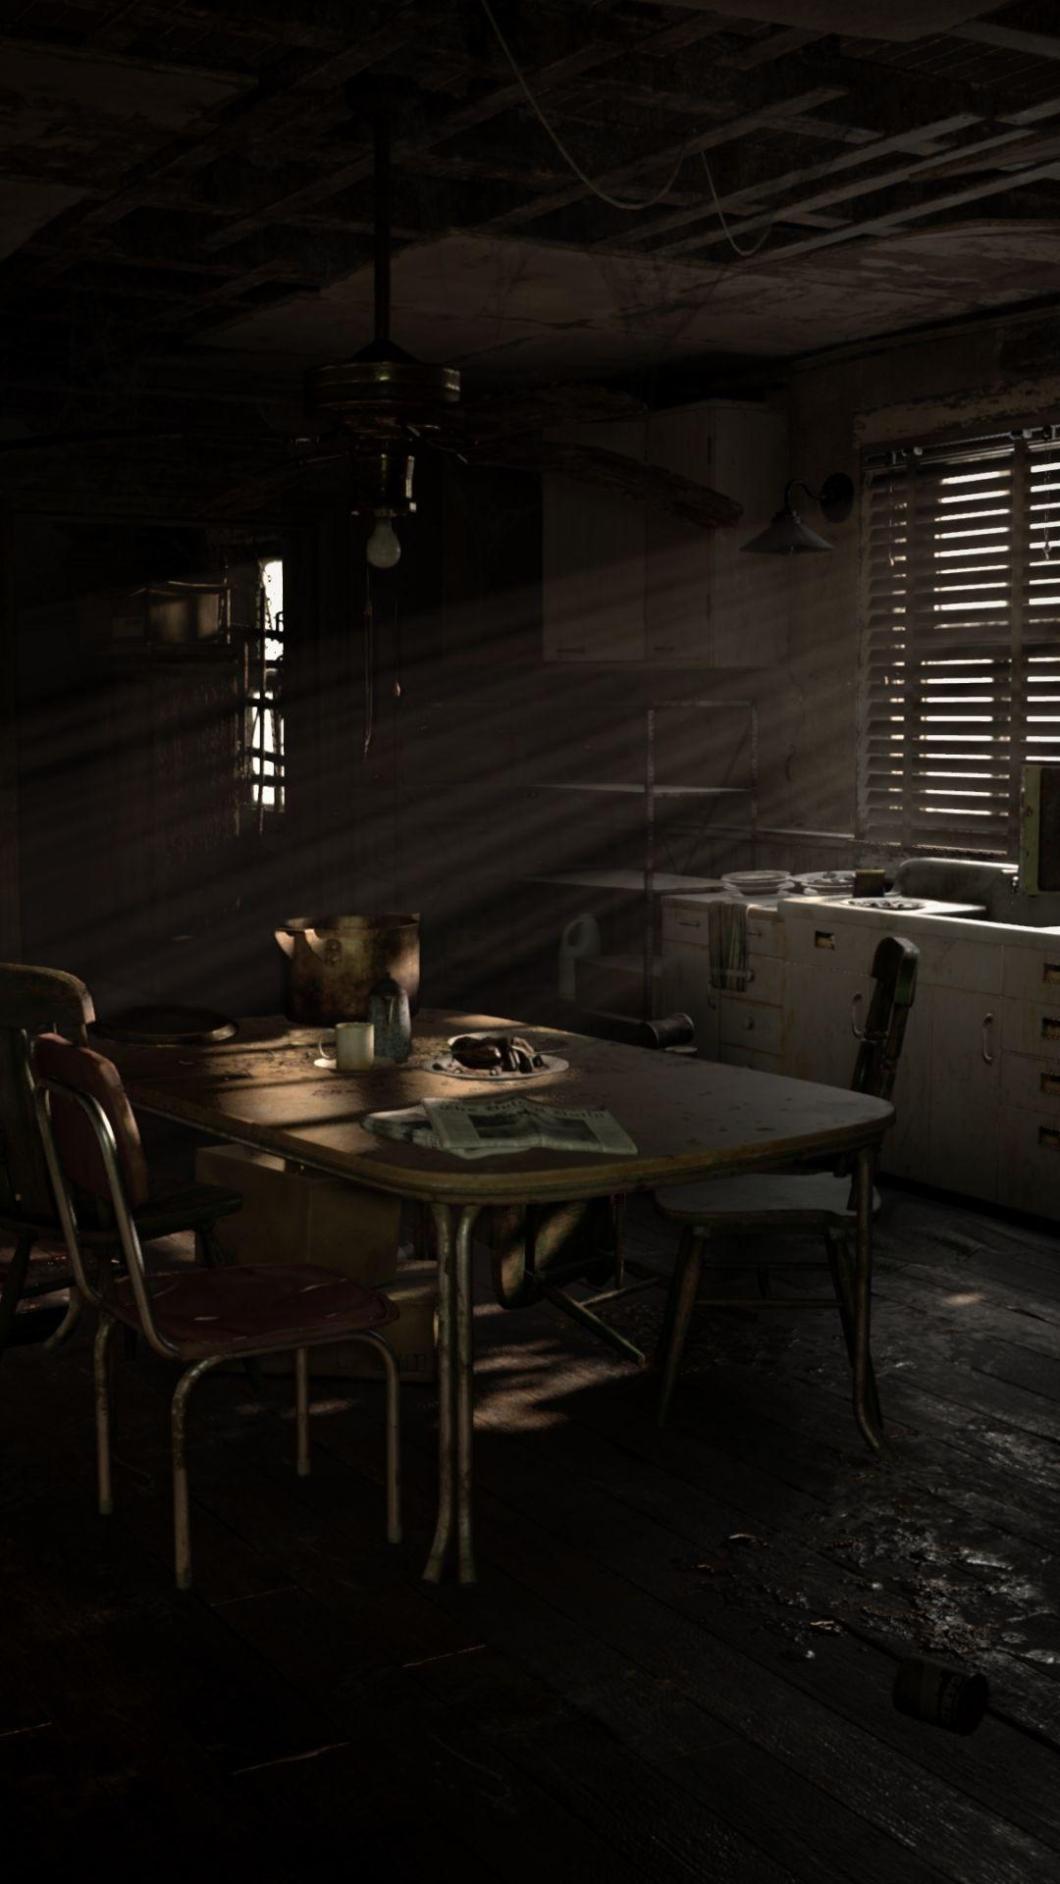 Resident Evil 7 Wallpaper Iphone 5 Walljdi Org